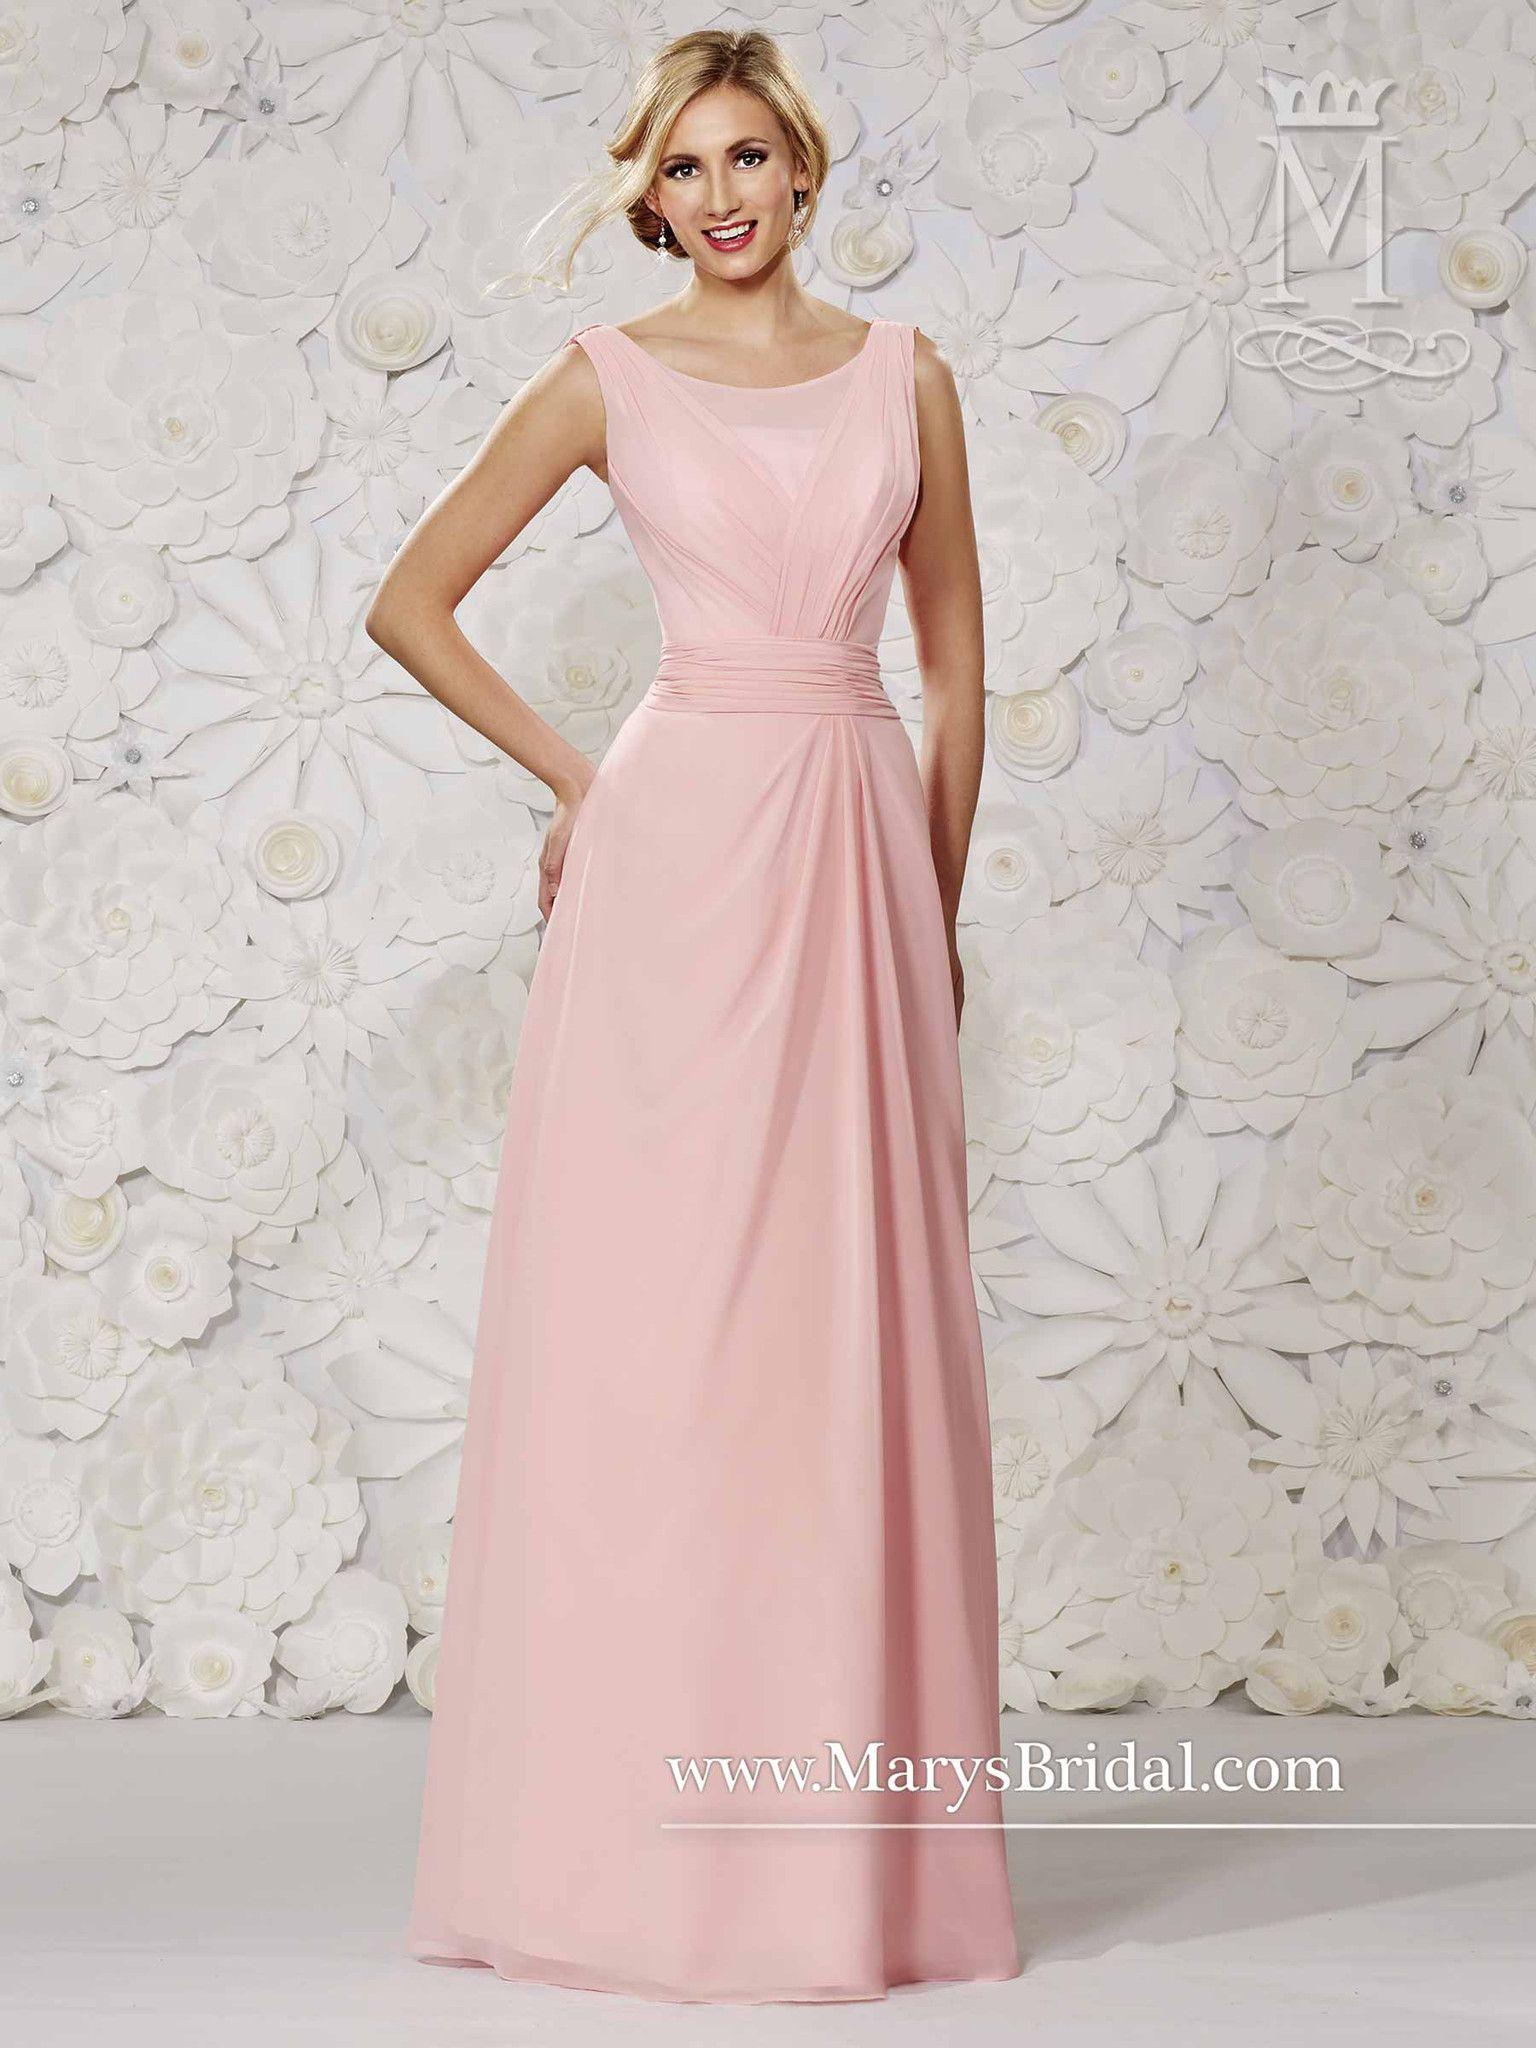 Chiffon bateau neckline gown women dresses pinterest neckline